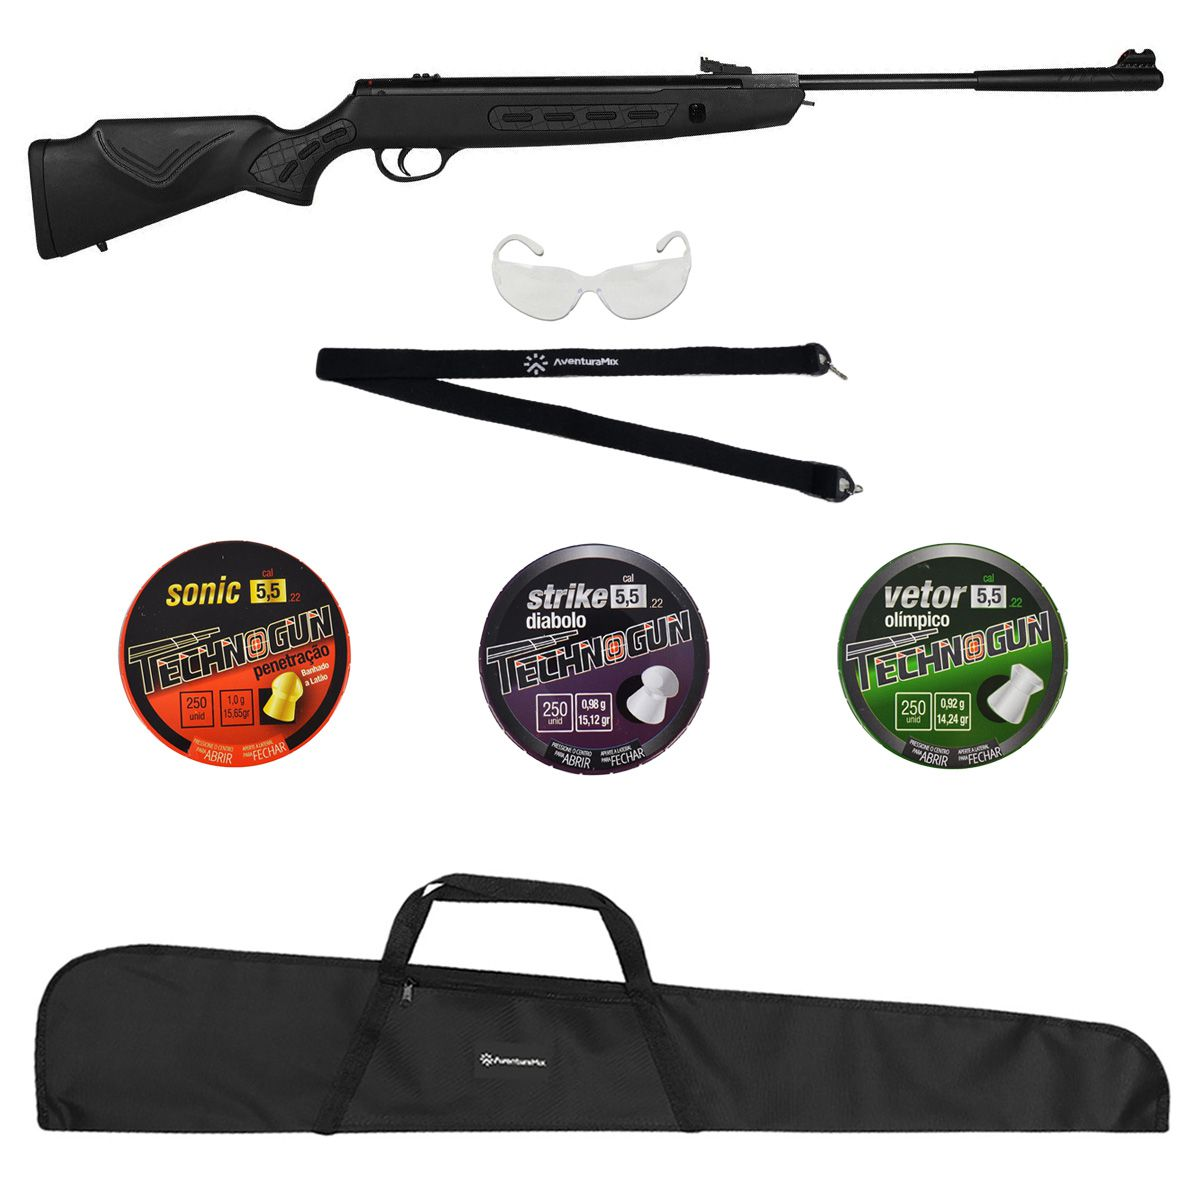 Carabina de Pressão Hatsan StrikerSniper1000S 5.5mm + Brindes + Chumbinhos